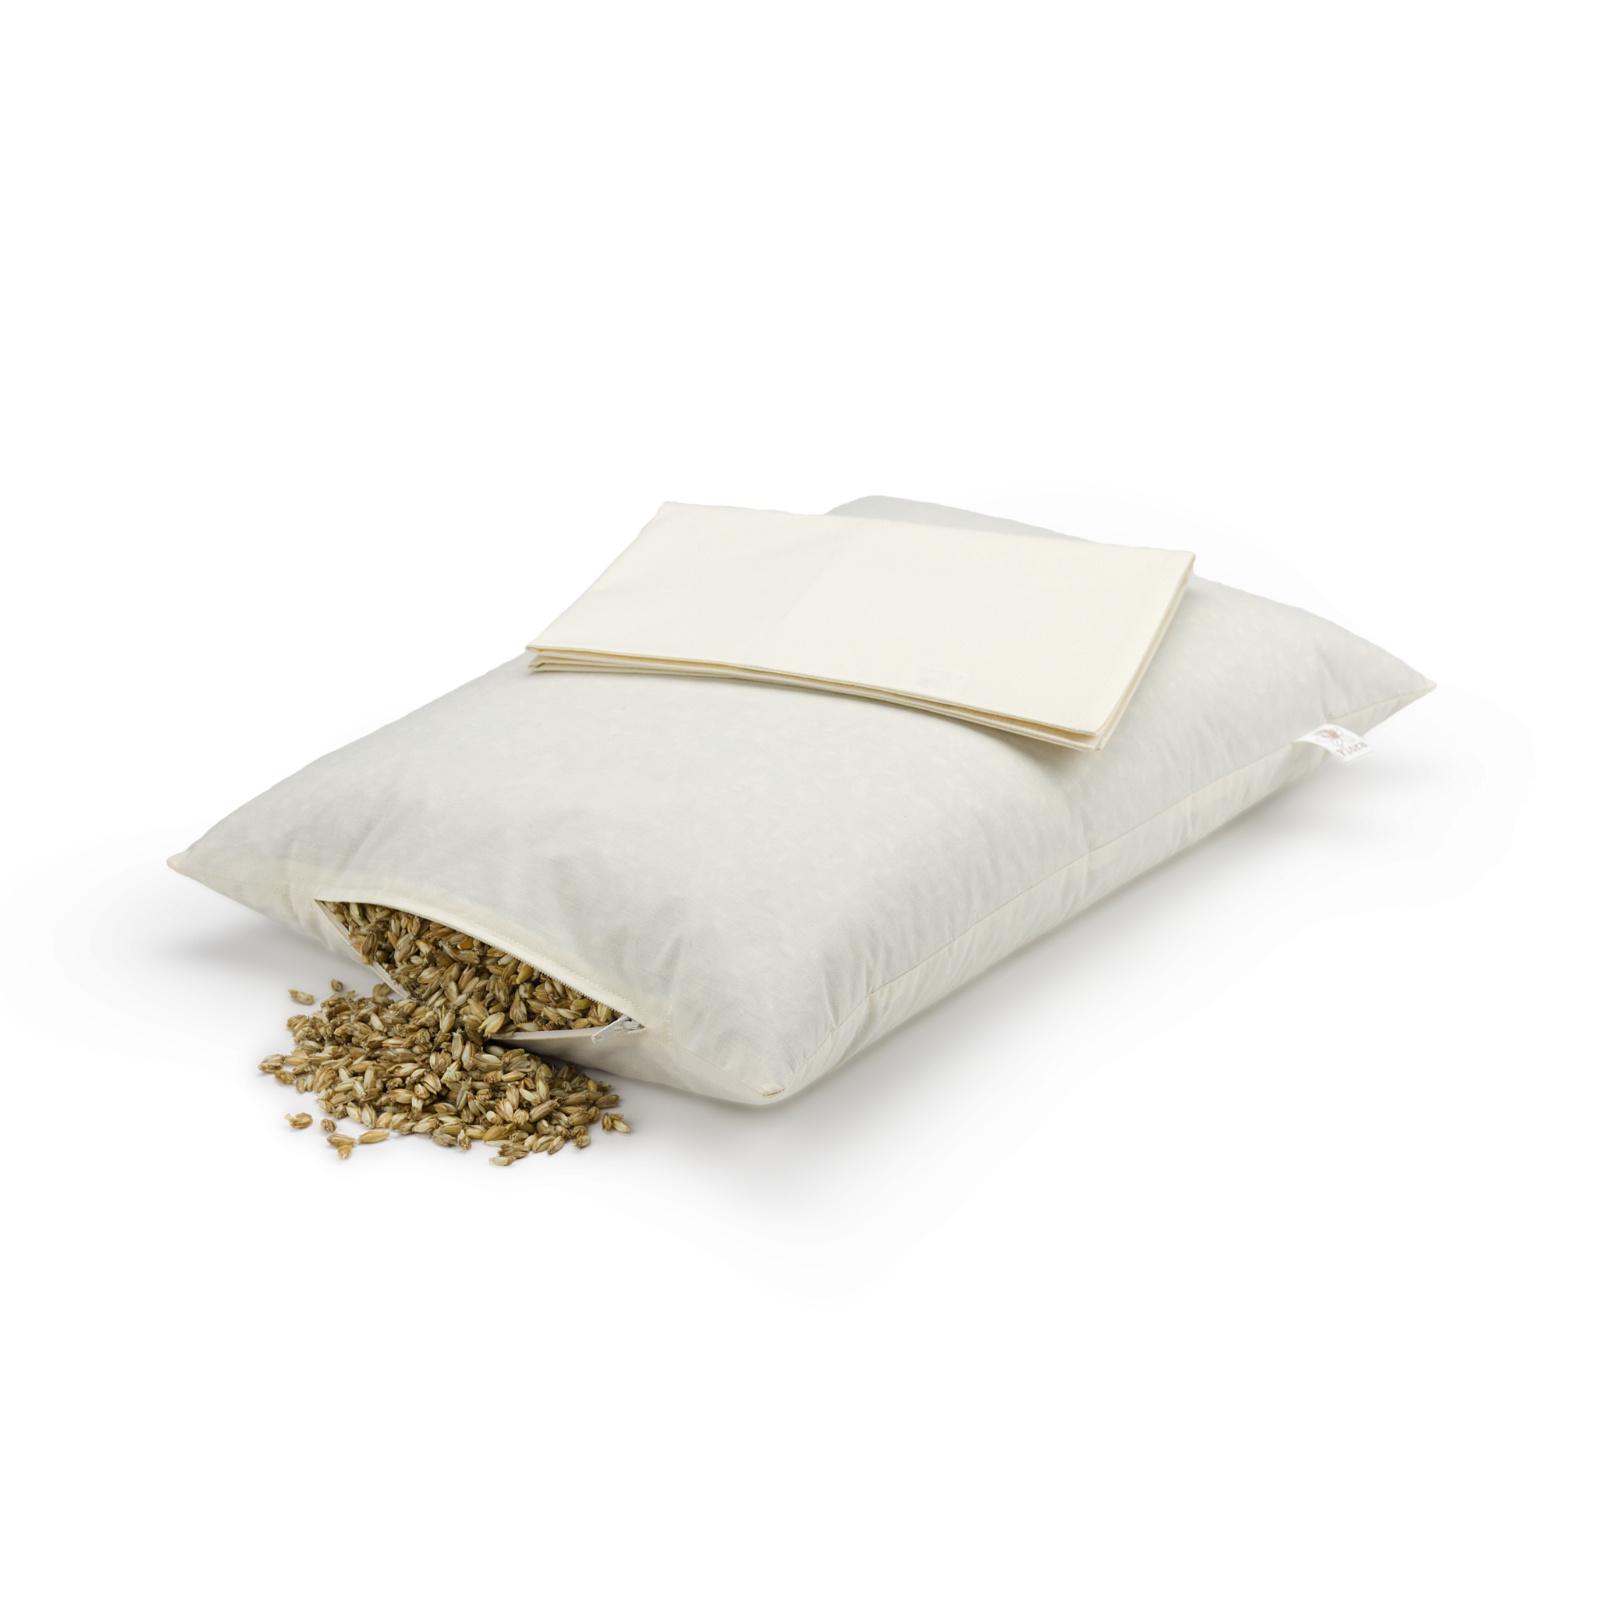 Sobbo Flora Classic spelled pillow + pillowcase